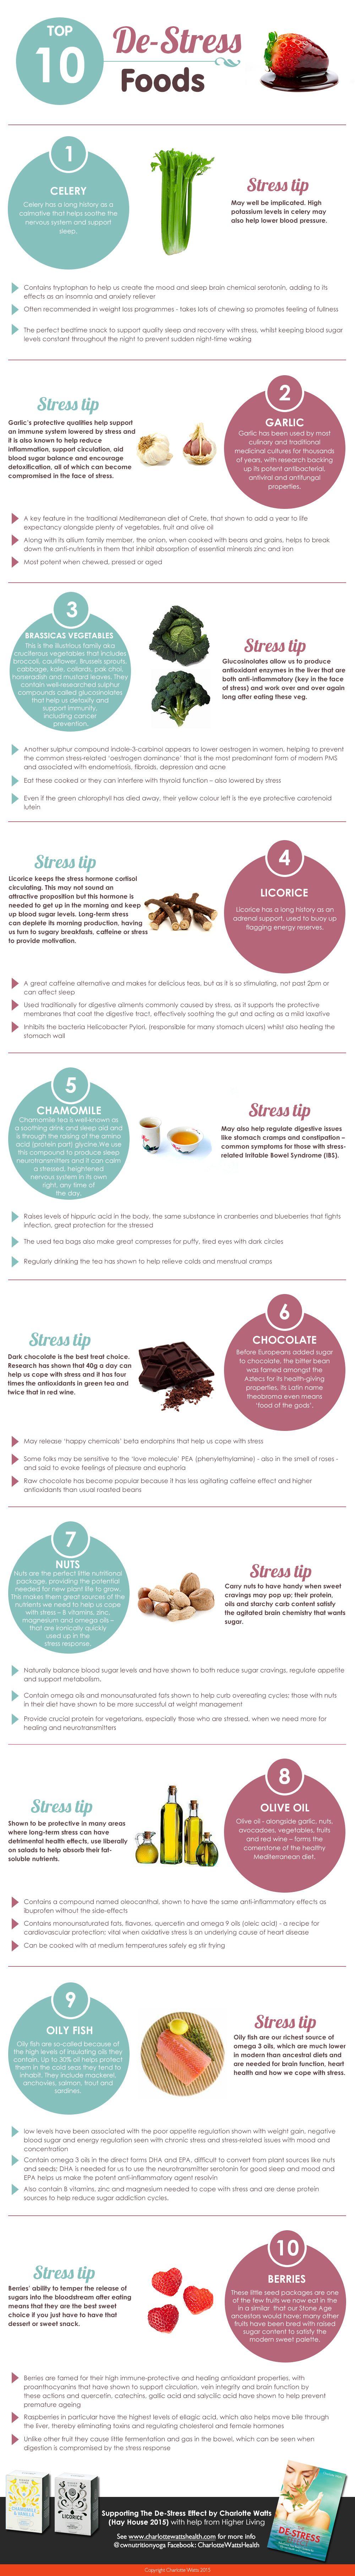 Top 10 DeStress Foods